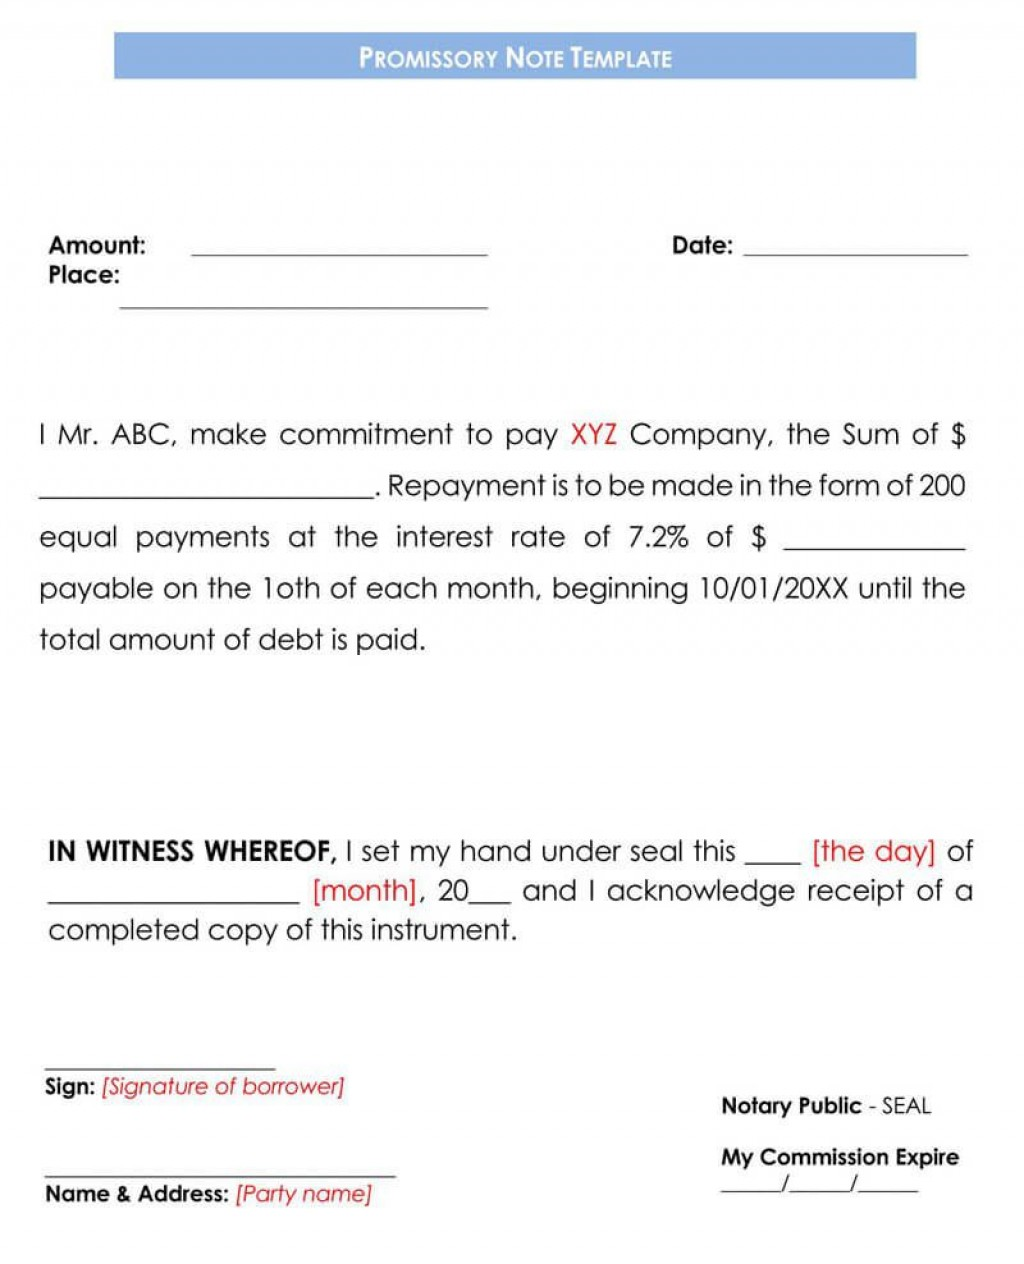 001 Best Blank Promissory Note Template Sample  Form Free DownloadLarge